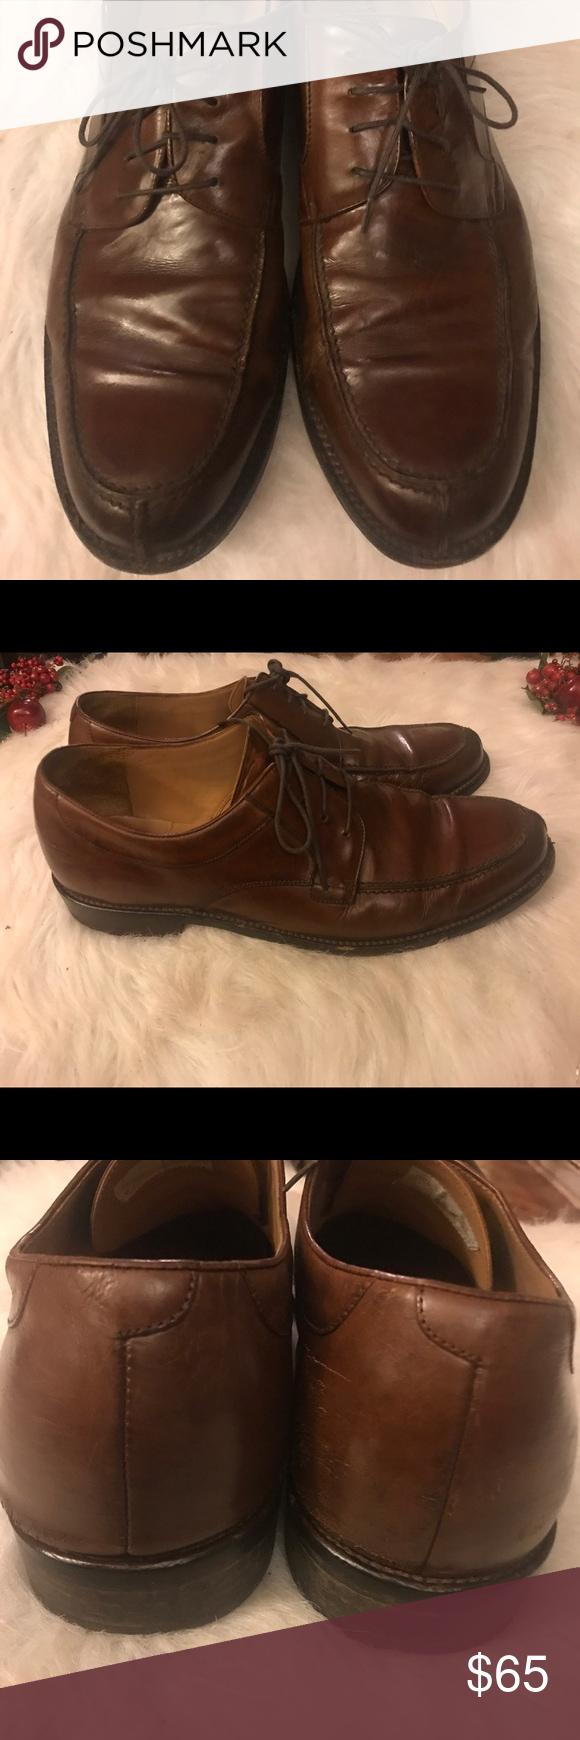 NEW POST💥 Eddie Bauer Shoes Shoes, Boat shoes, Clothes